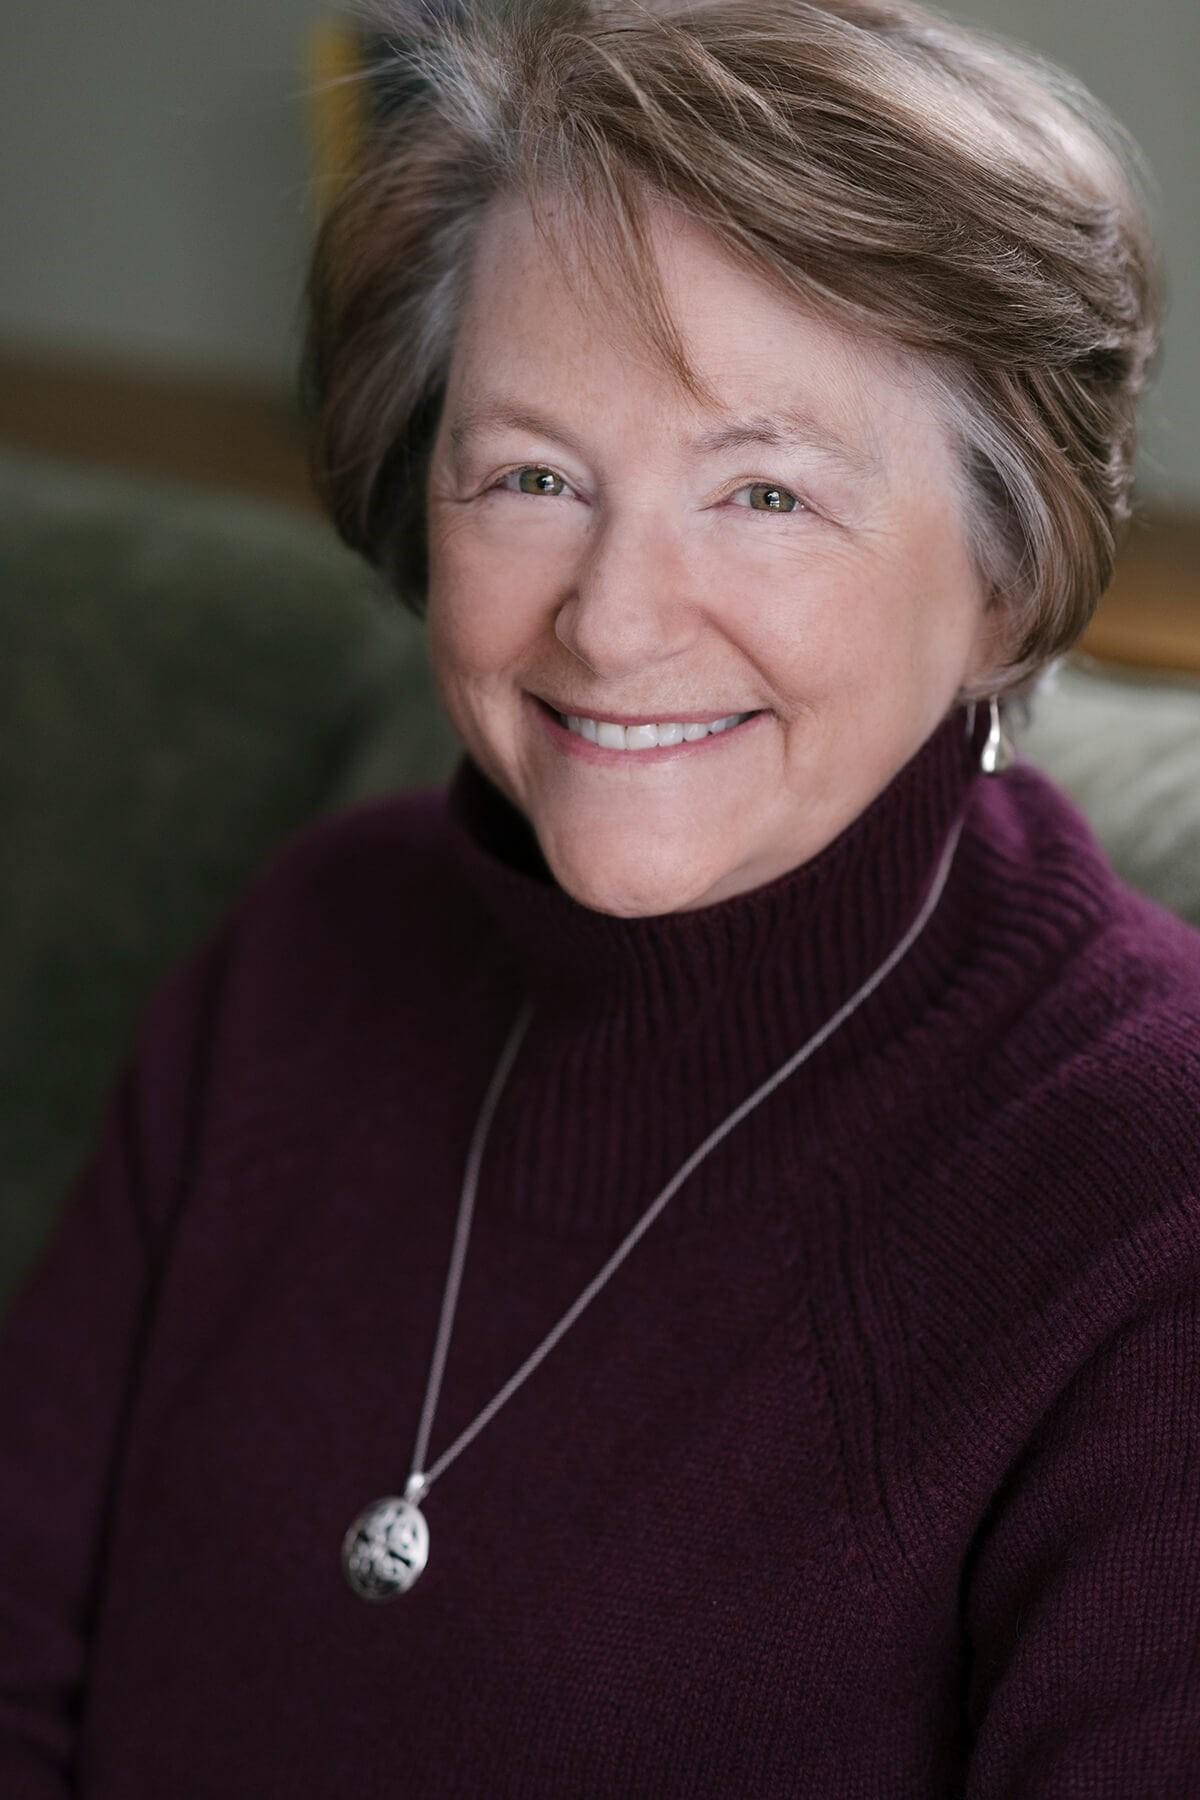 Author event with Maren Cooper